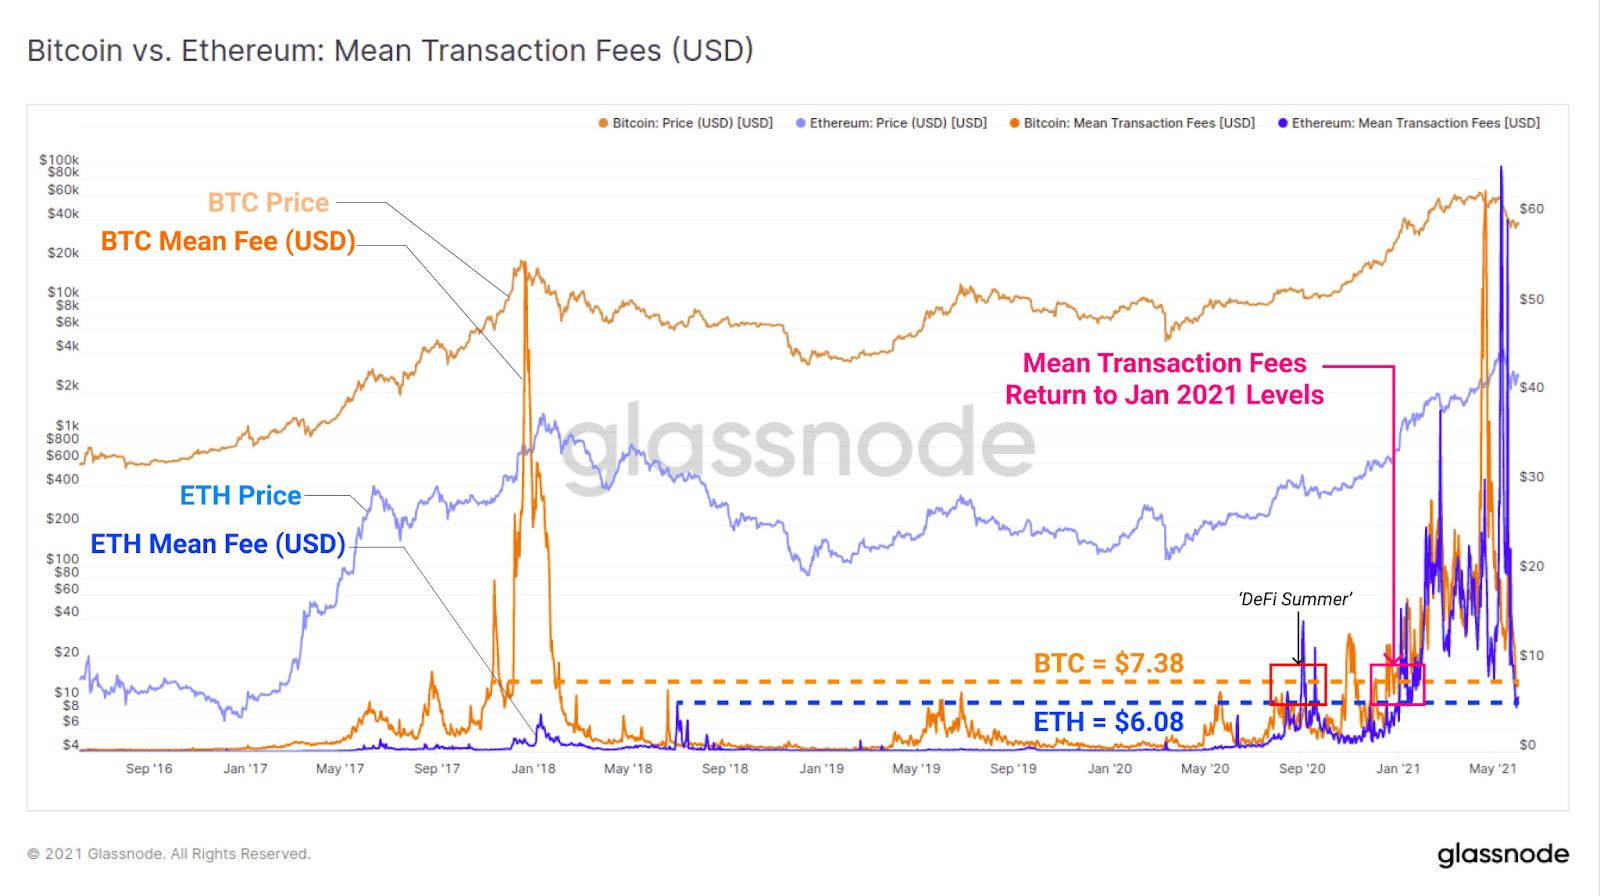 BTC vs ETH Transaction Fees